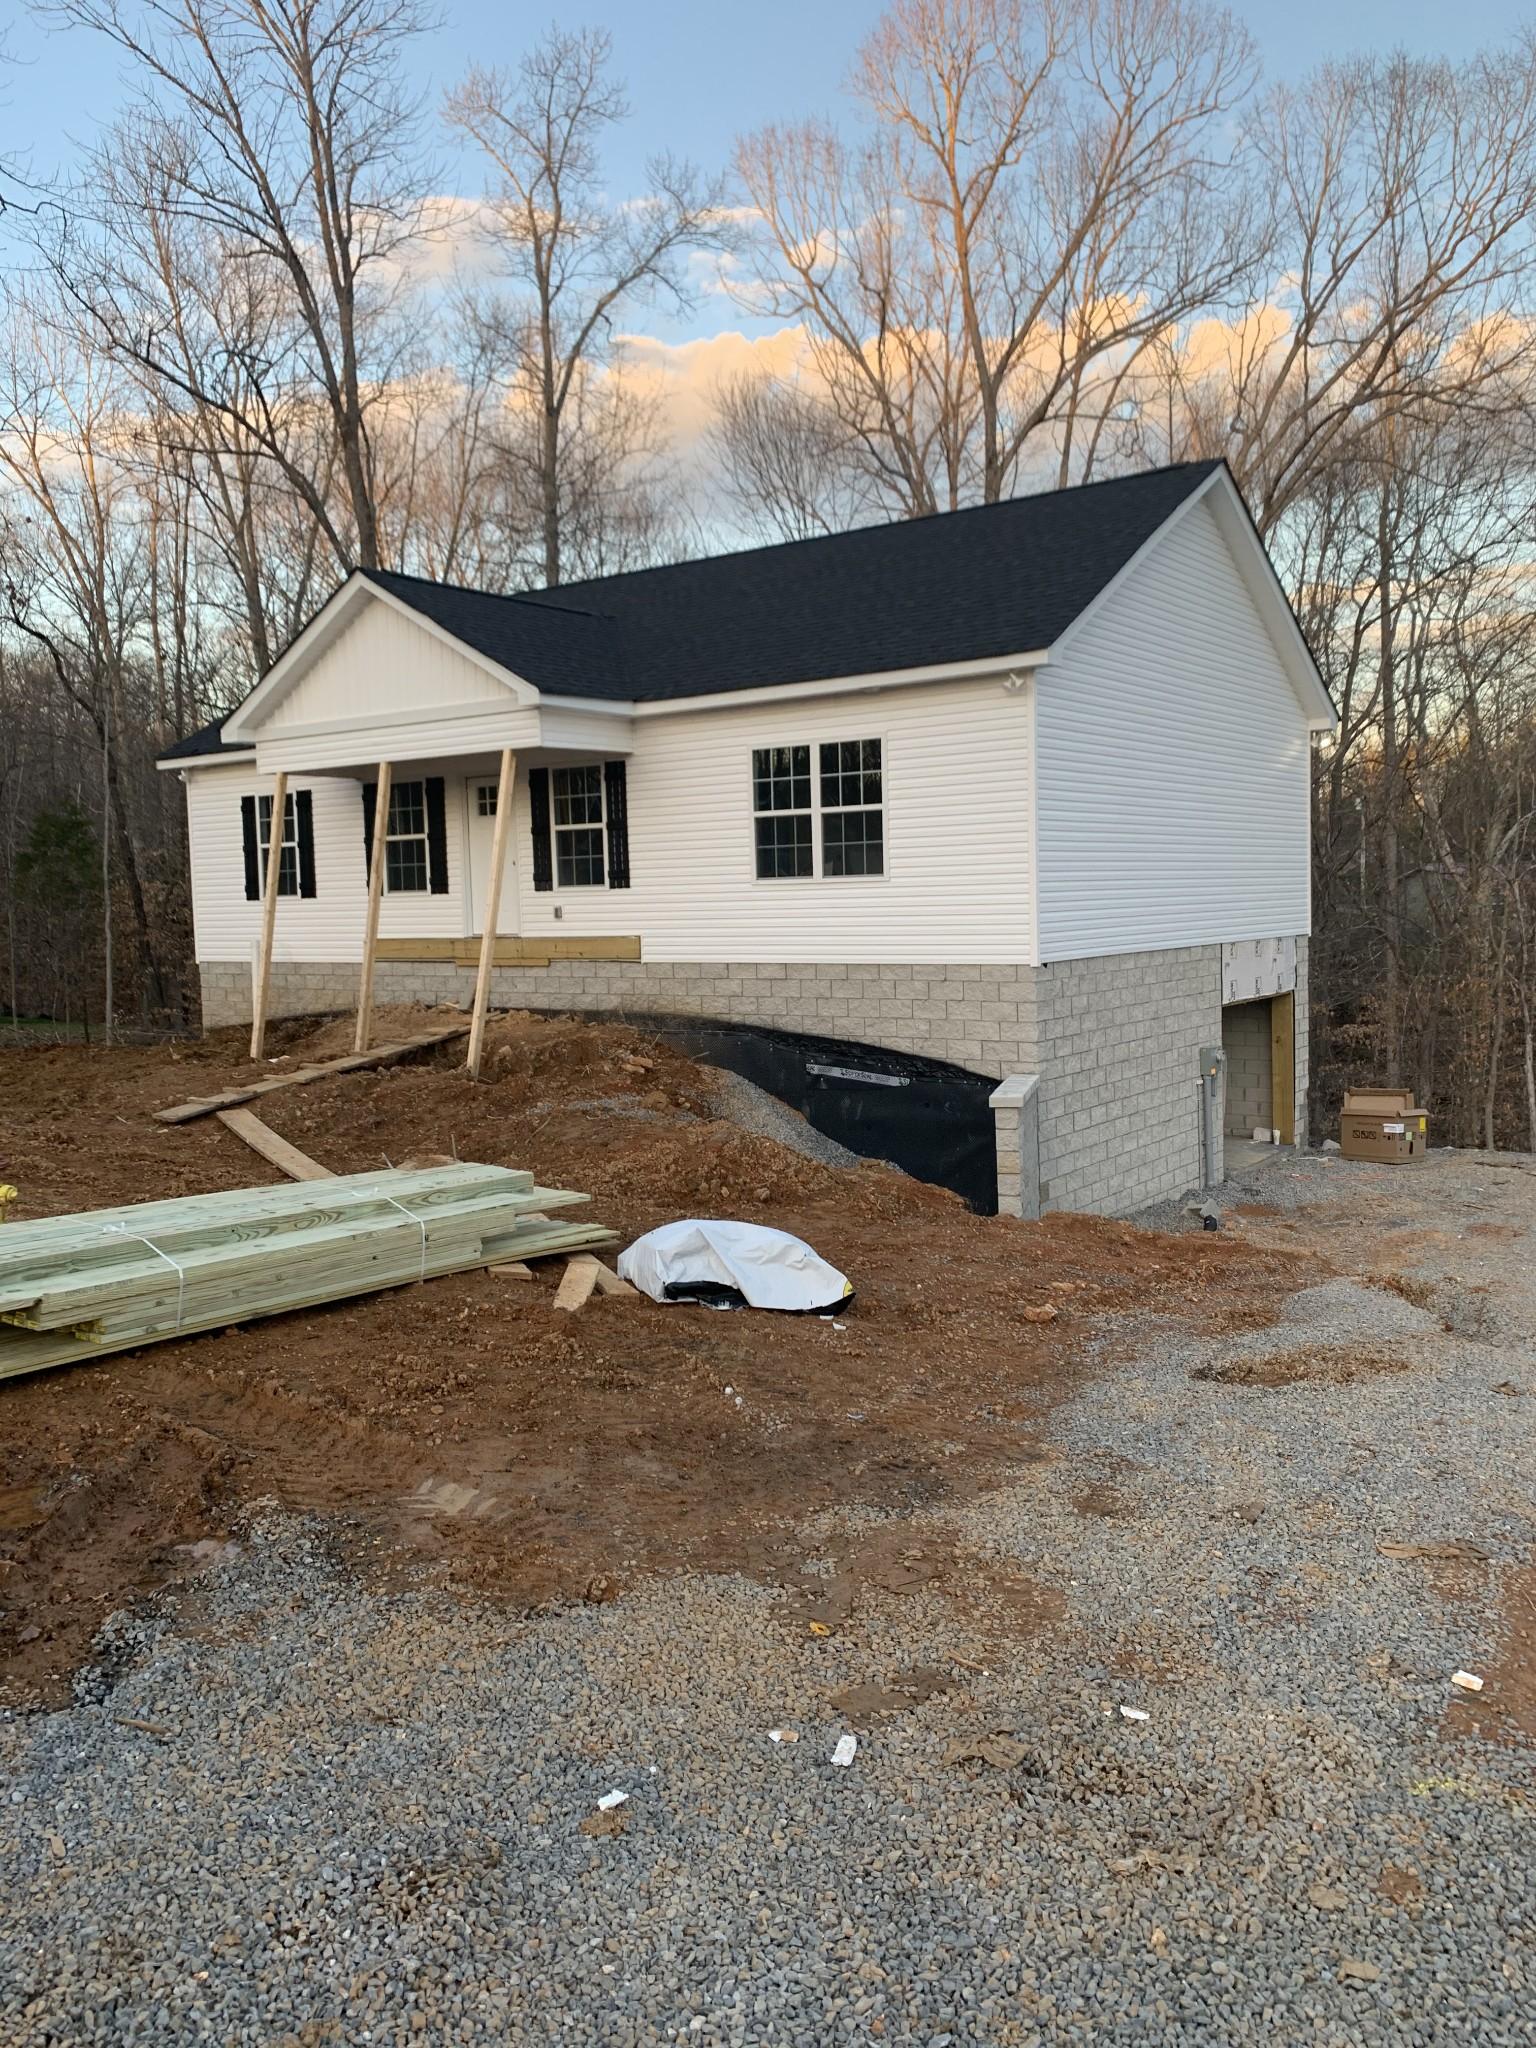 613 Evening Shade, S, White Bluff, TN 37187 - White Bluff, TN real estate listing